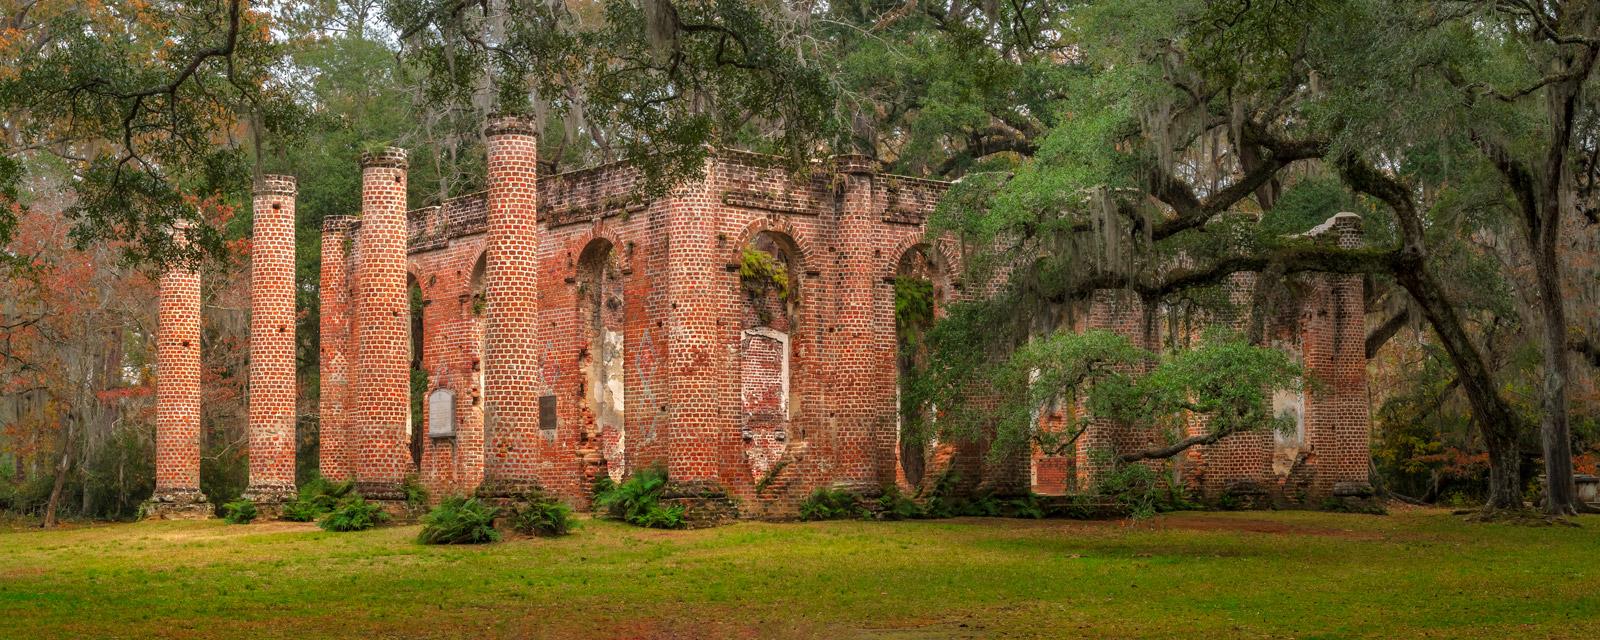 South Carolina, Sheldon, Church, Oak, Tree, limited edition, photograph, fine art, landscape, photo